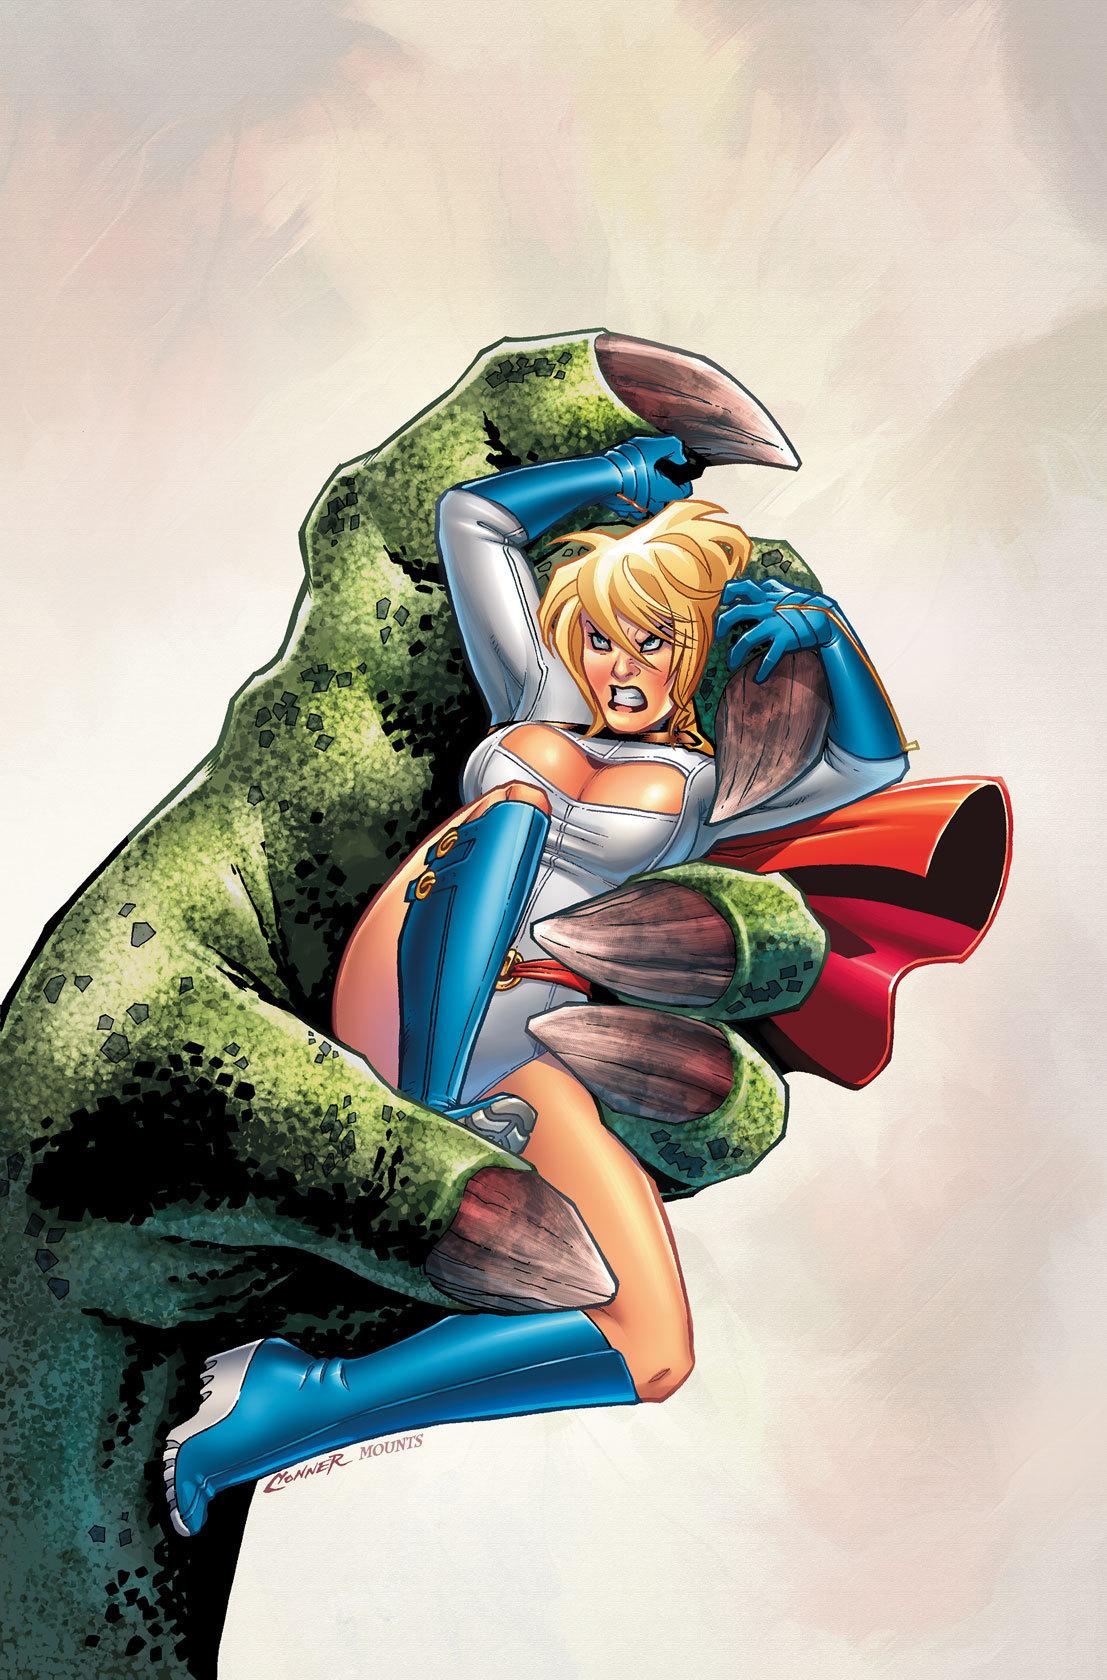 Dc comics power girl 4